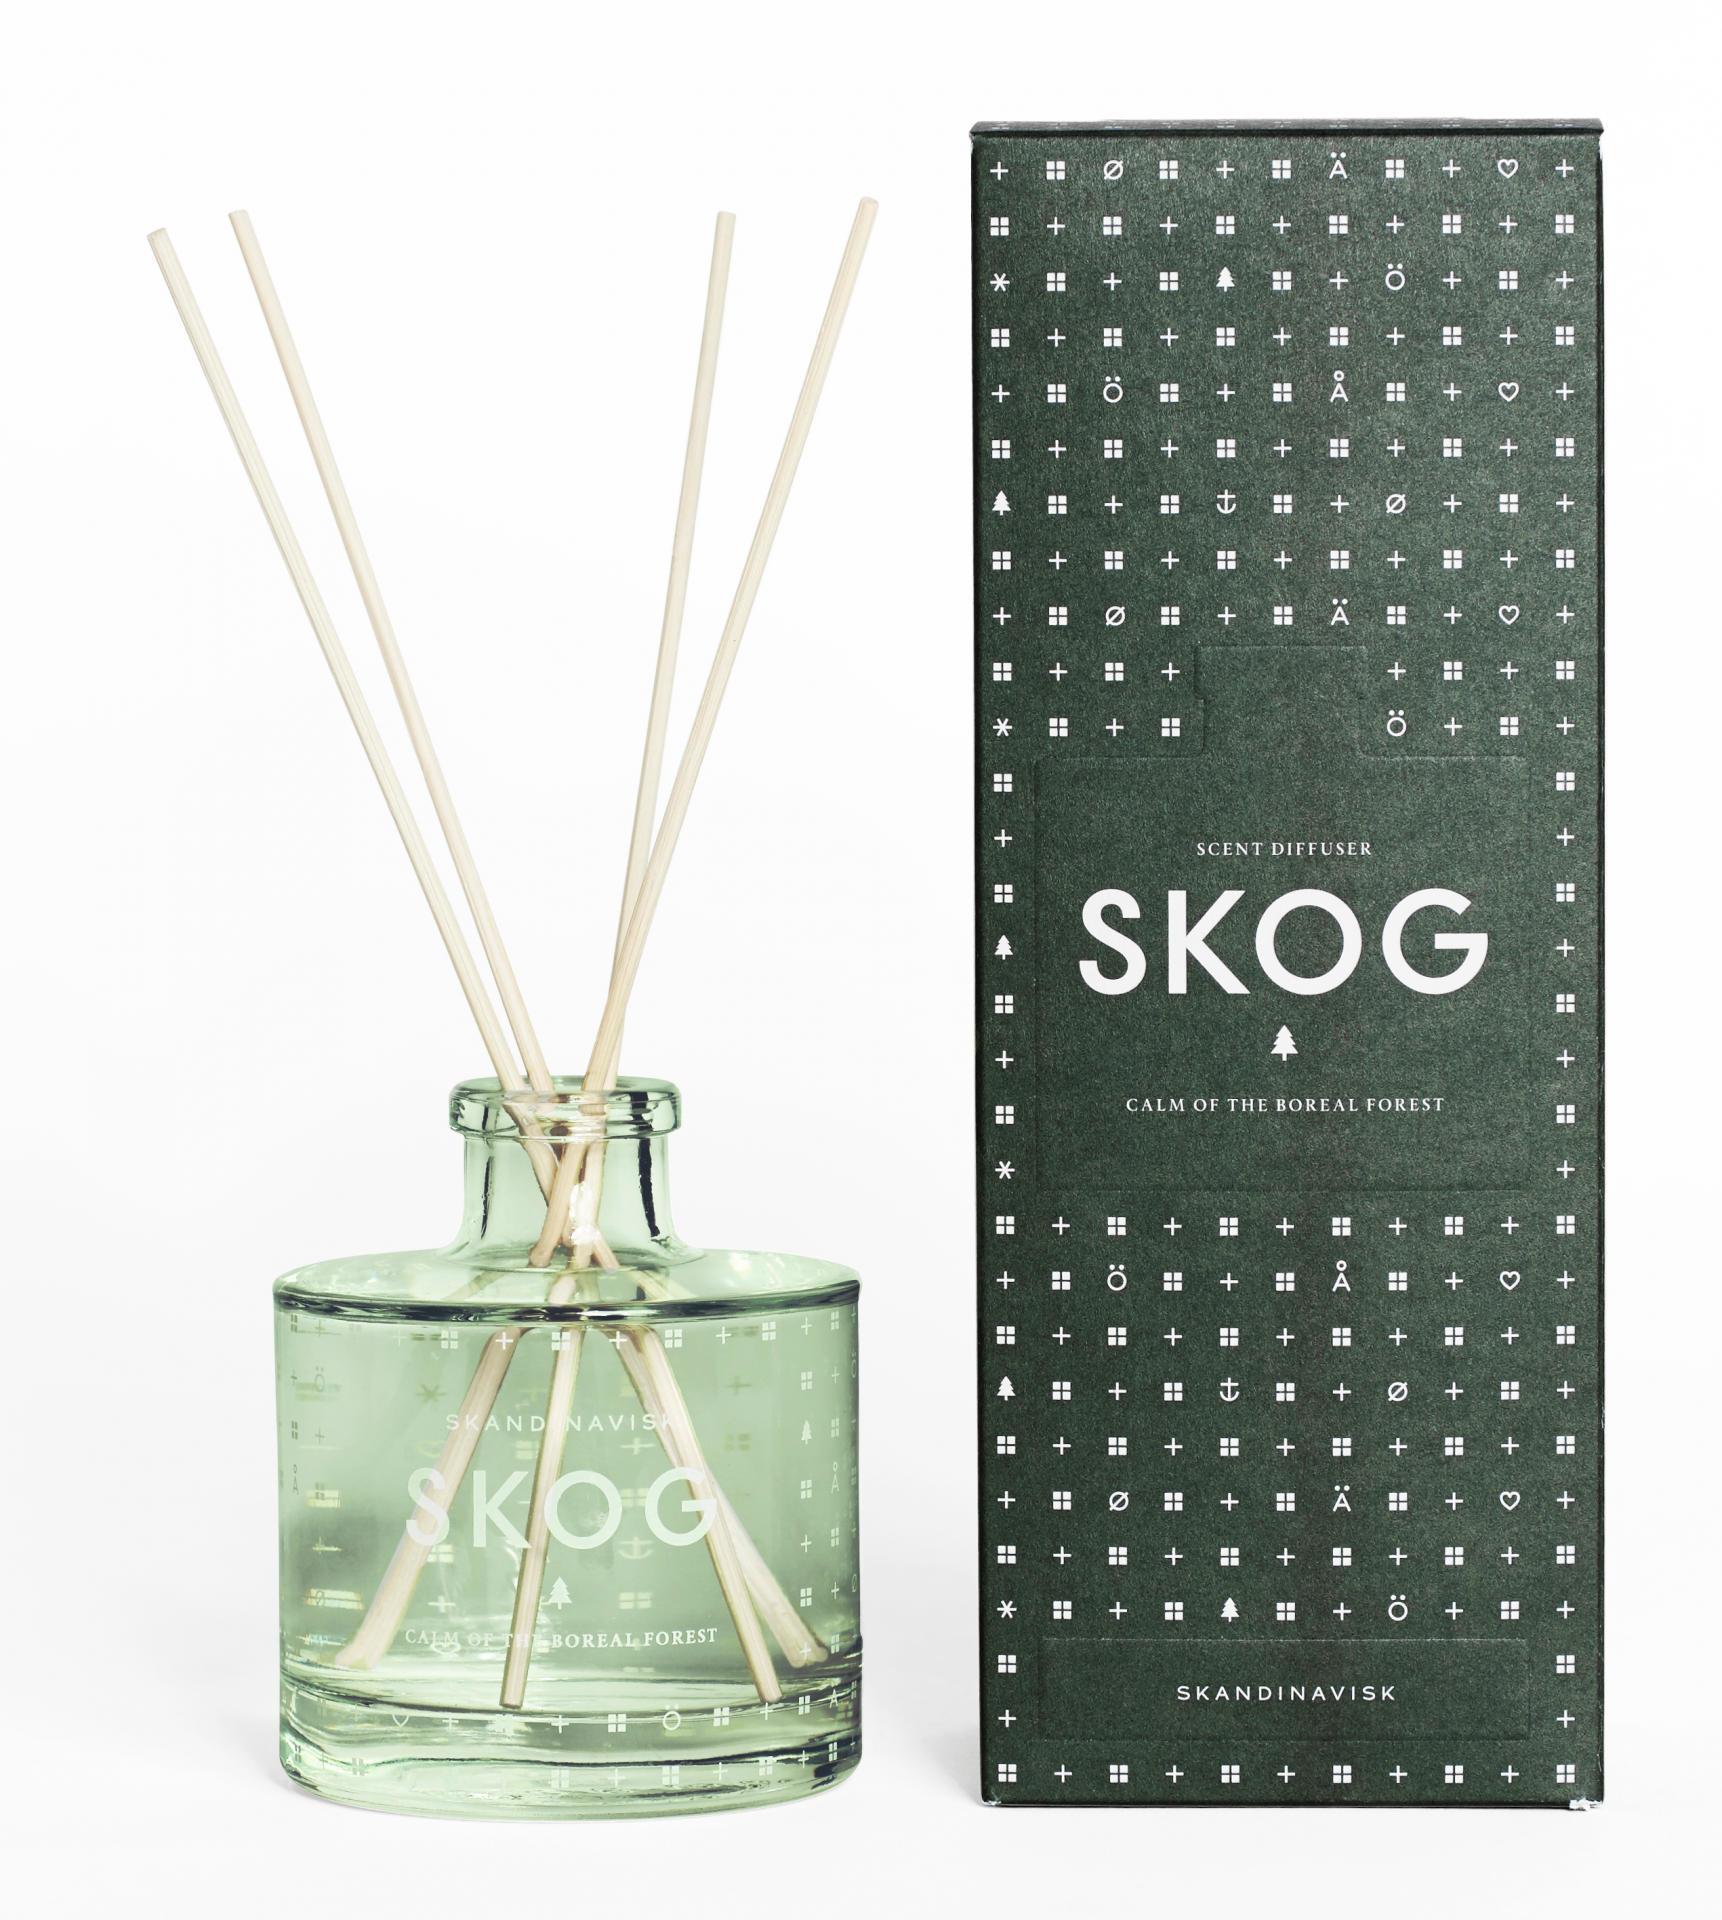 SKANDINAVISK Vonný difuzér SKOG (les) 200 ml, zelená barva, sklo